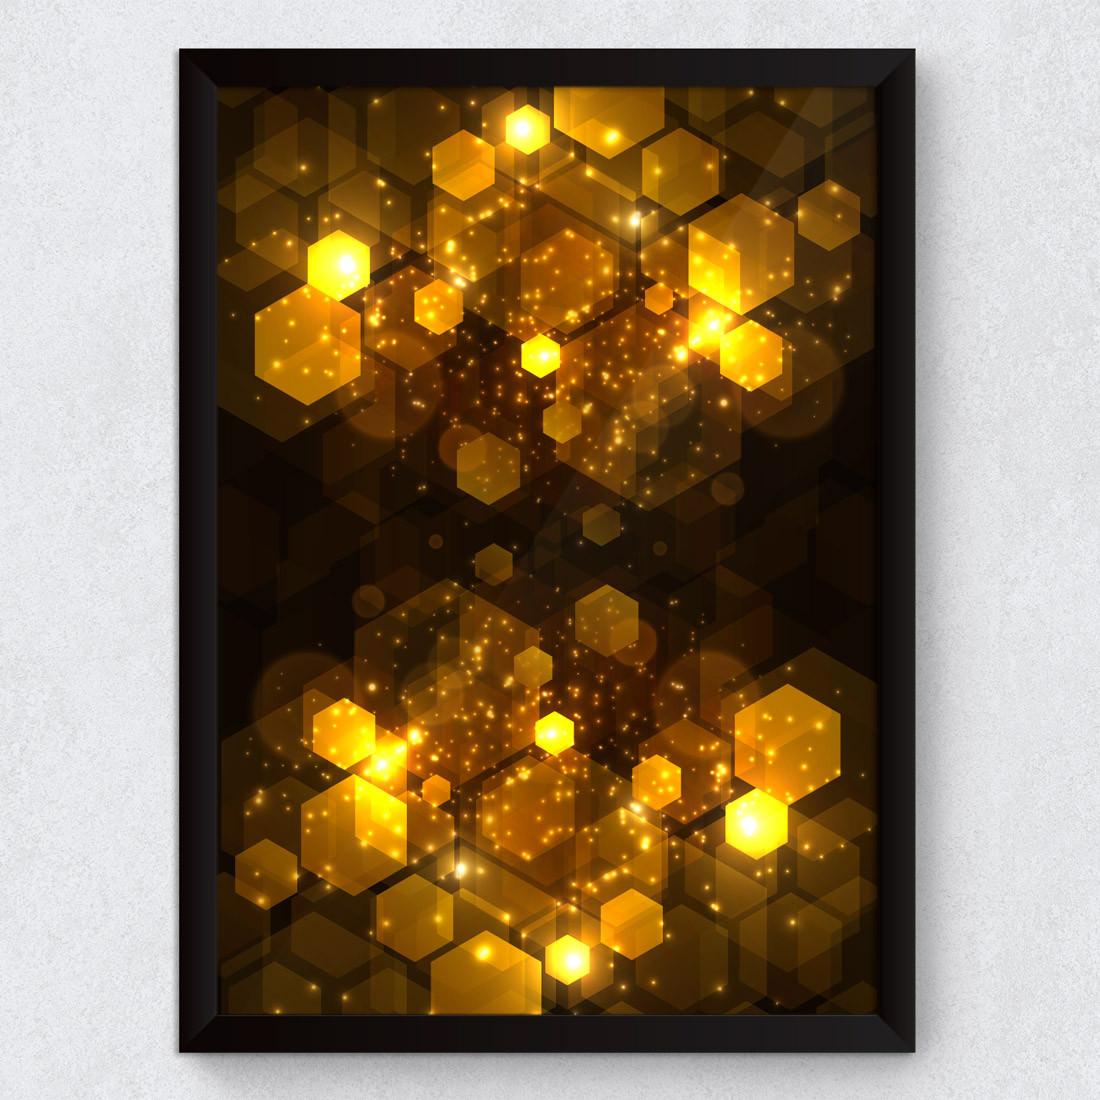 268af241d Quadro Decorativo Abstrato Geométrico Dourado Quadro Decorativo Abstrato  Geométrico Dourado ...